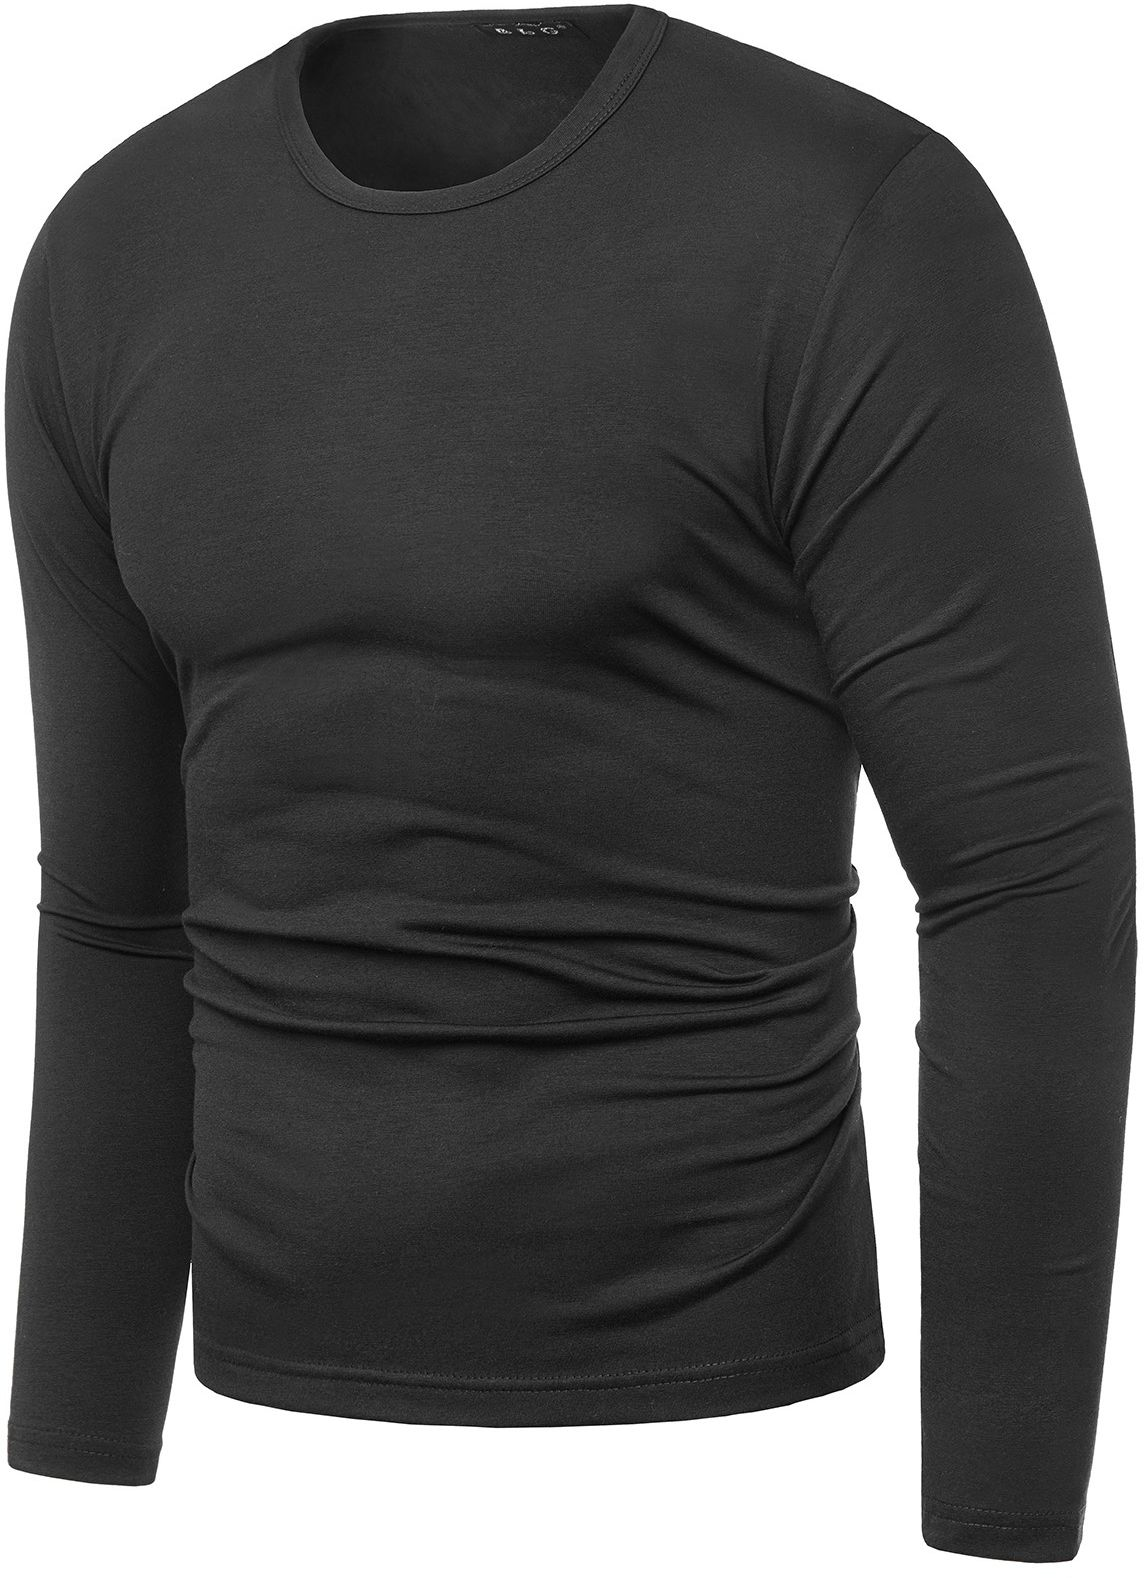 Bluza męska longsleeve N01L - czarna